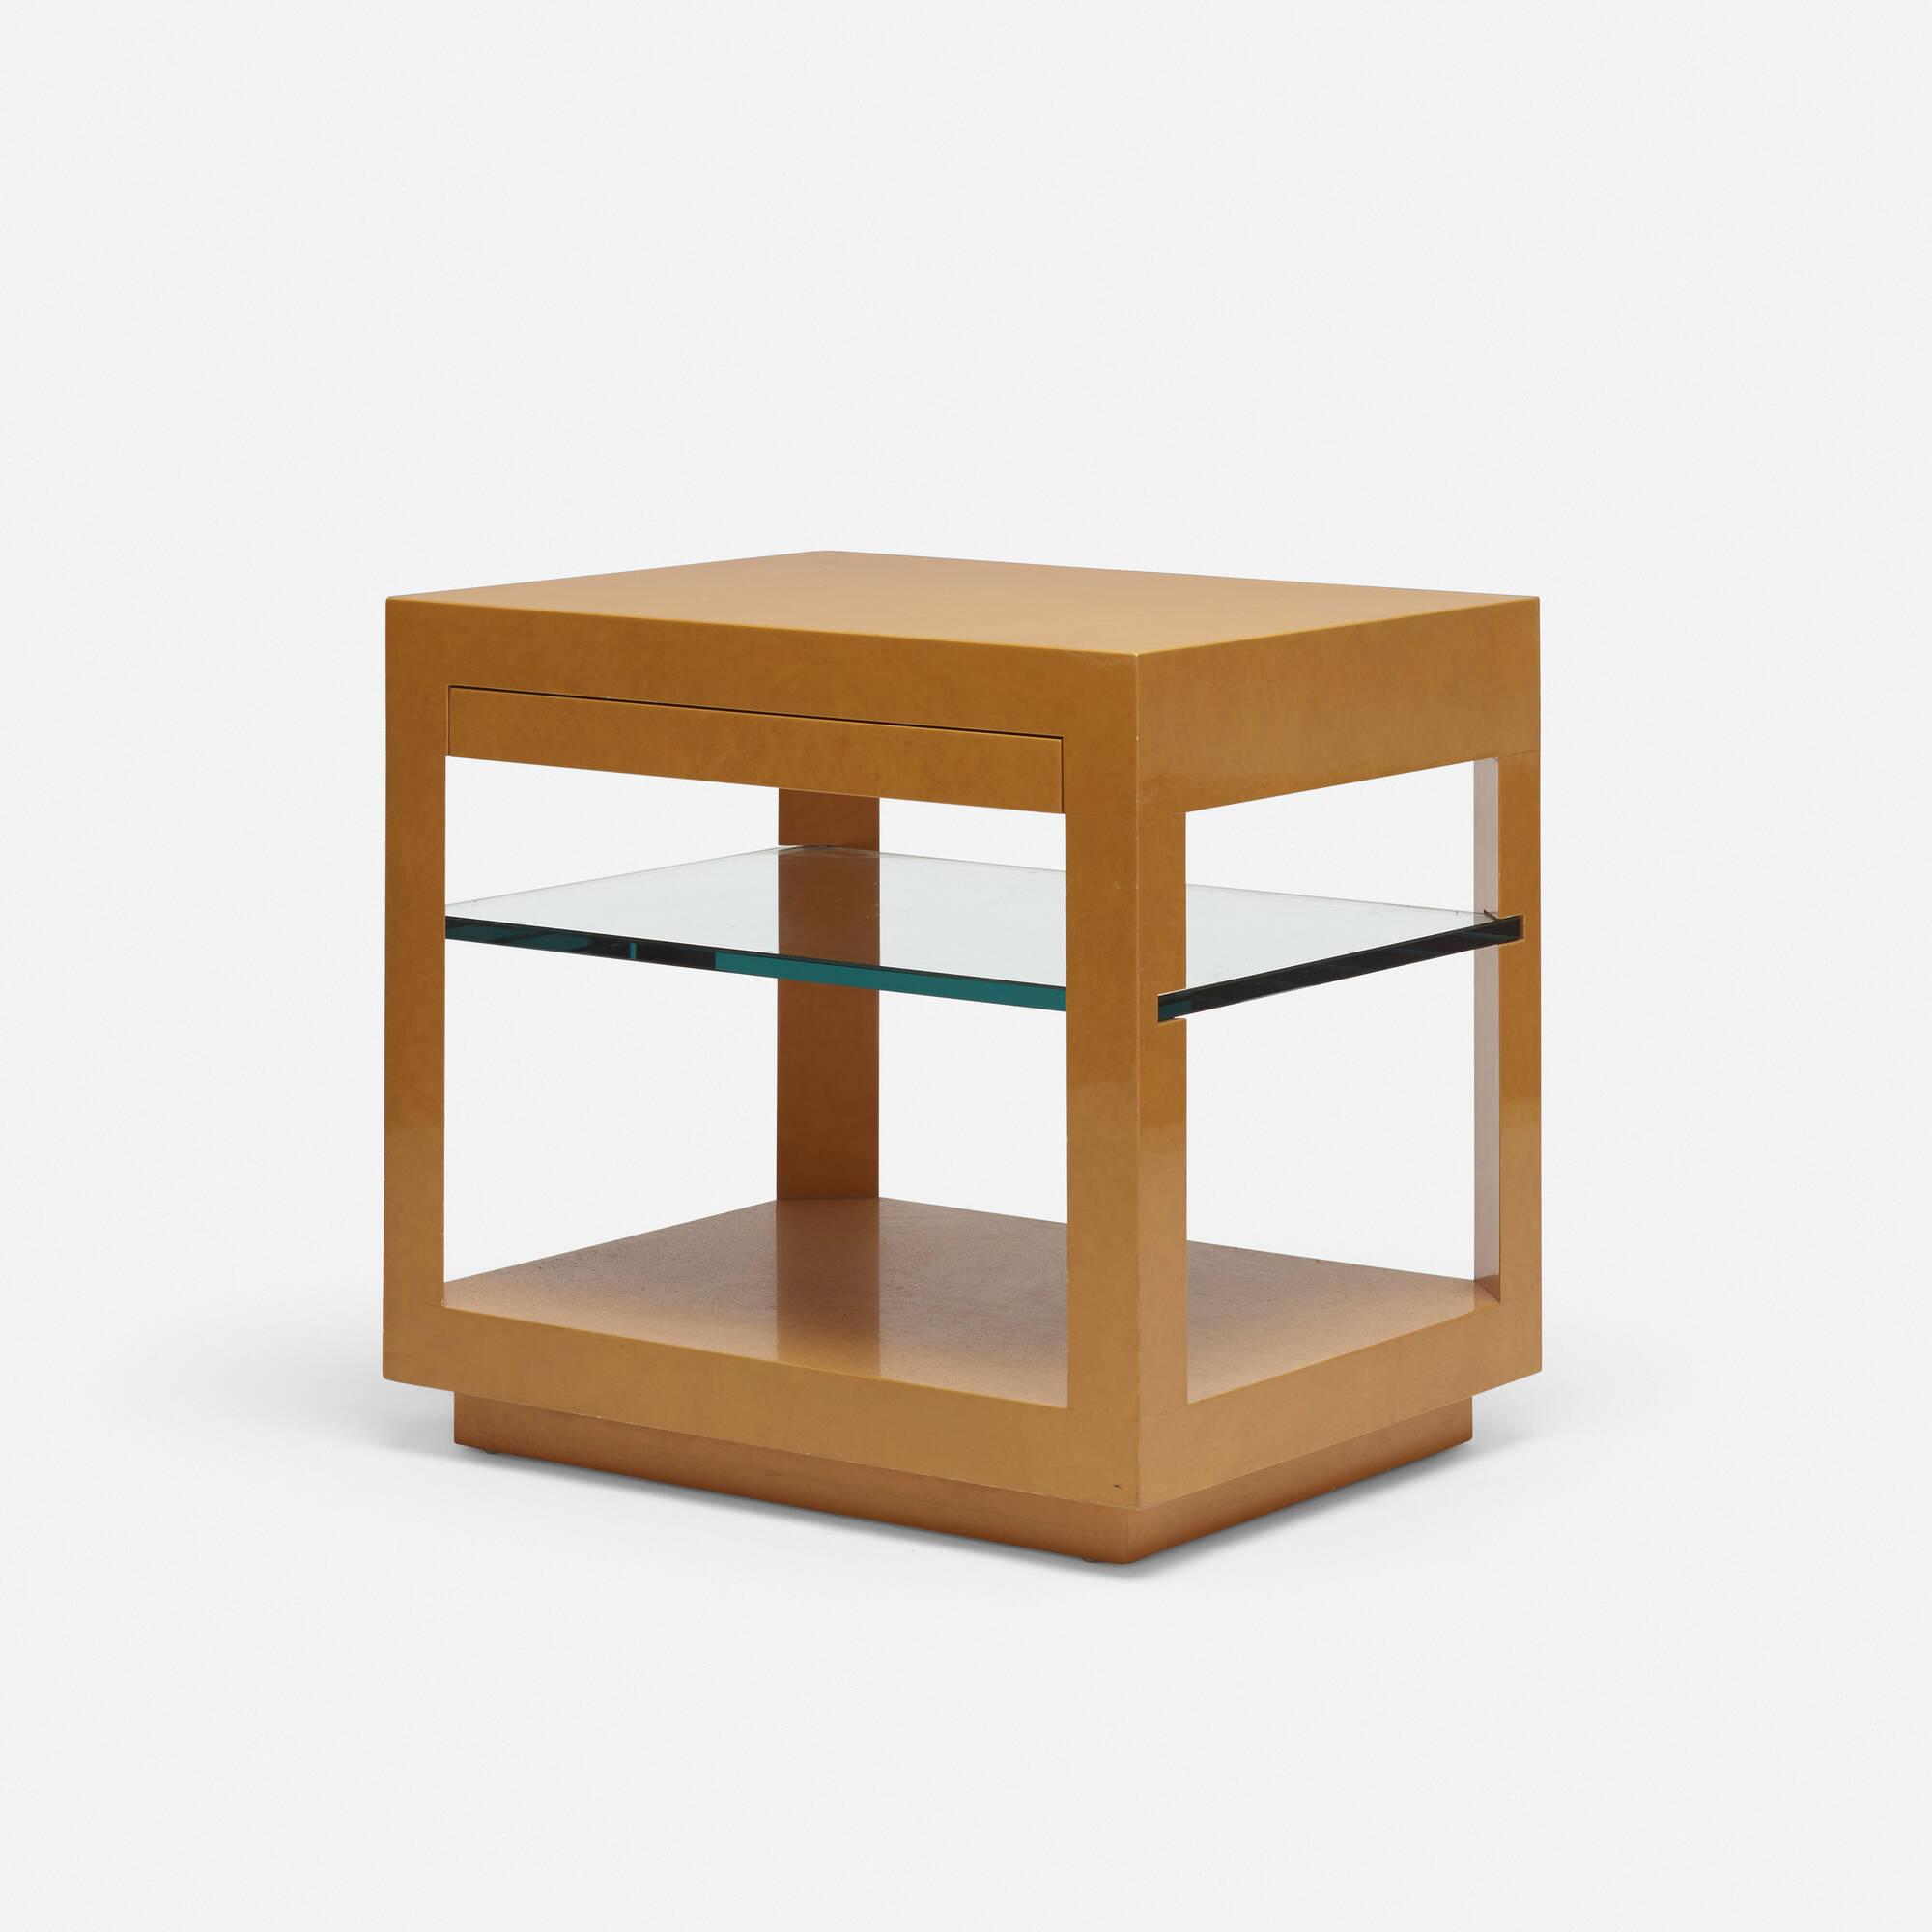 738: Karl Springer / occasional table (1 of 2)